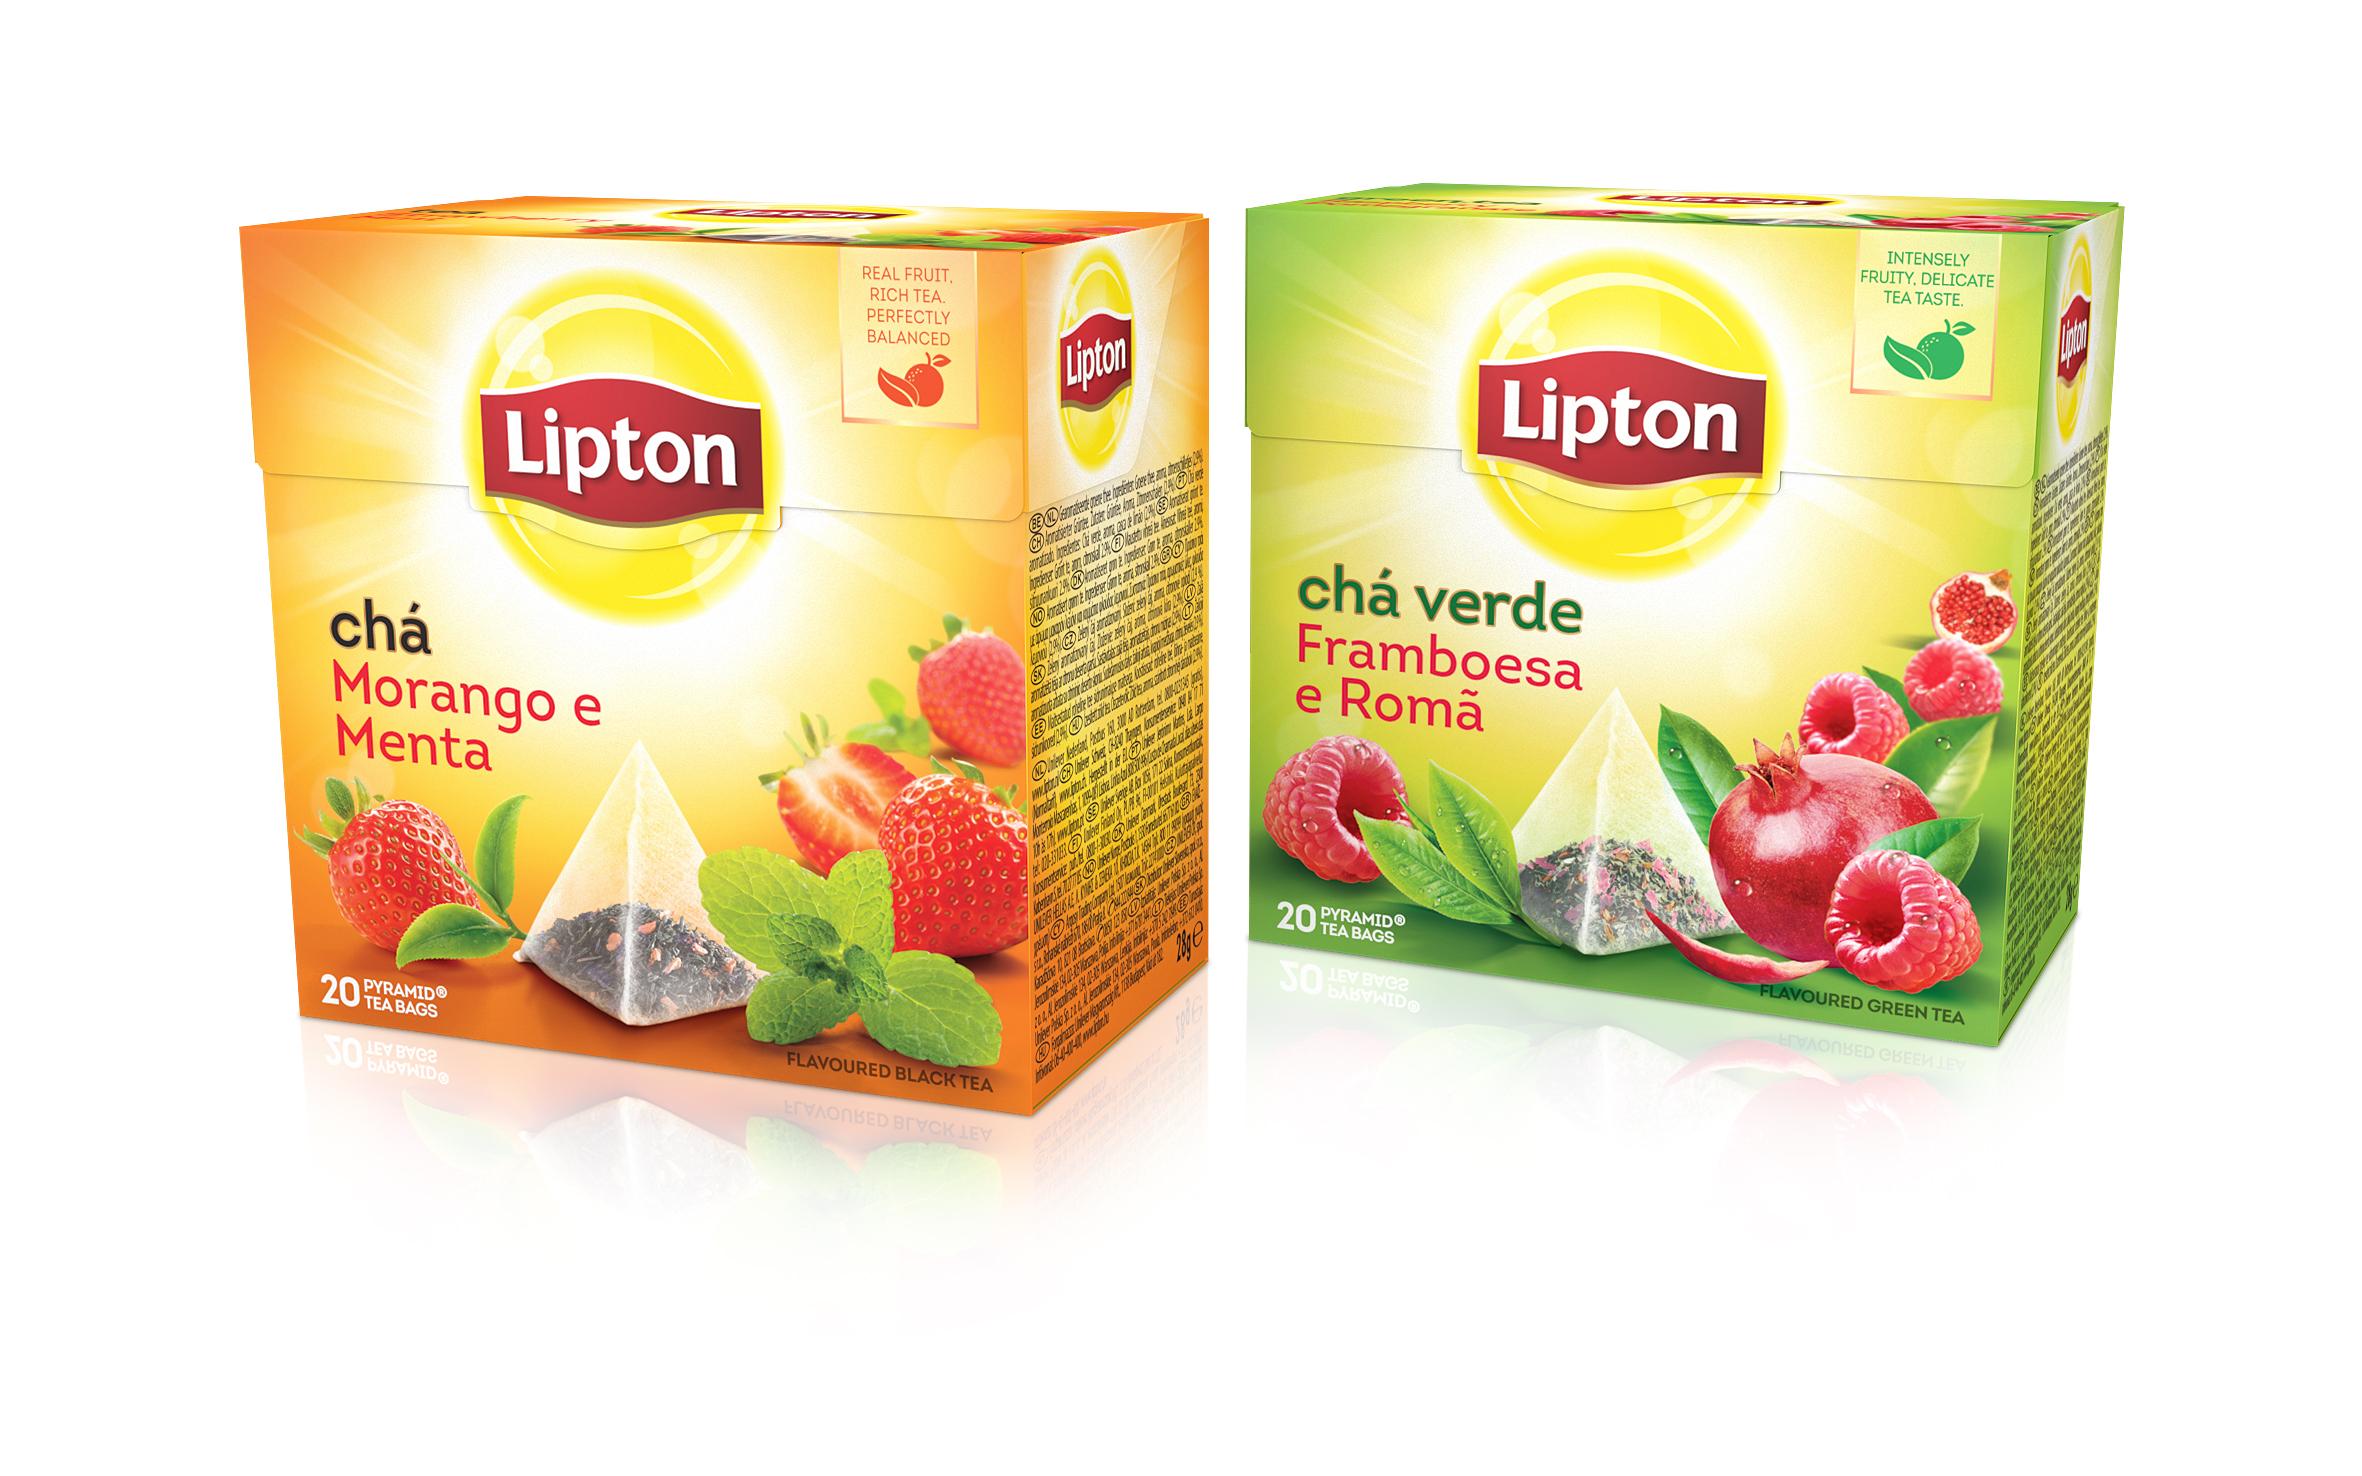 Lipton Framboesa Romã & Lipton Morango e Menta